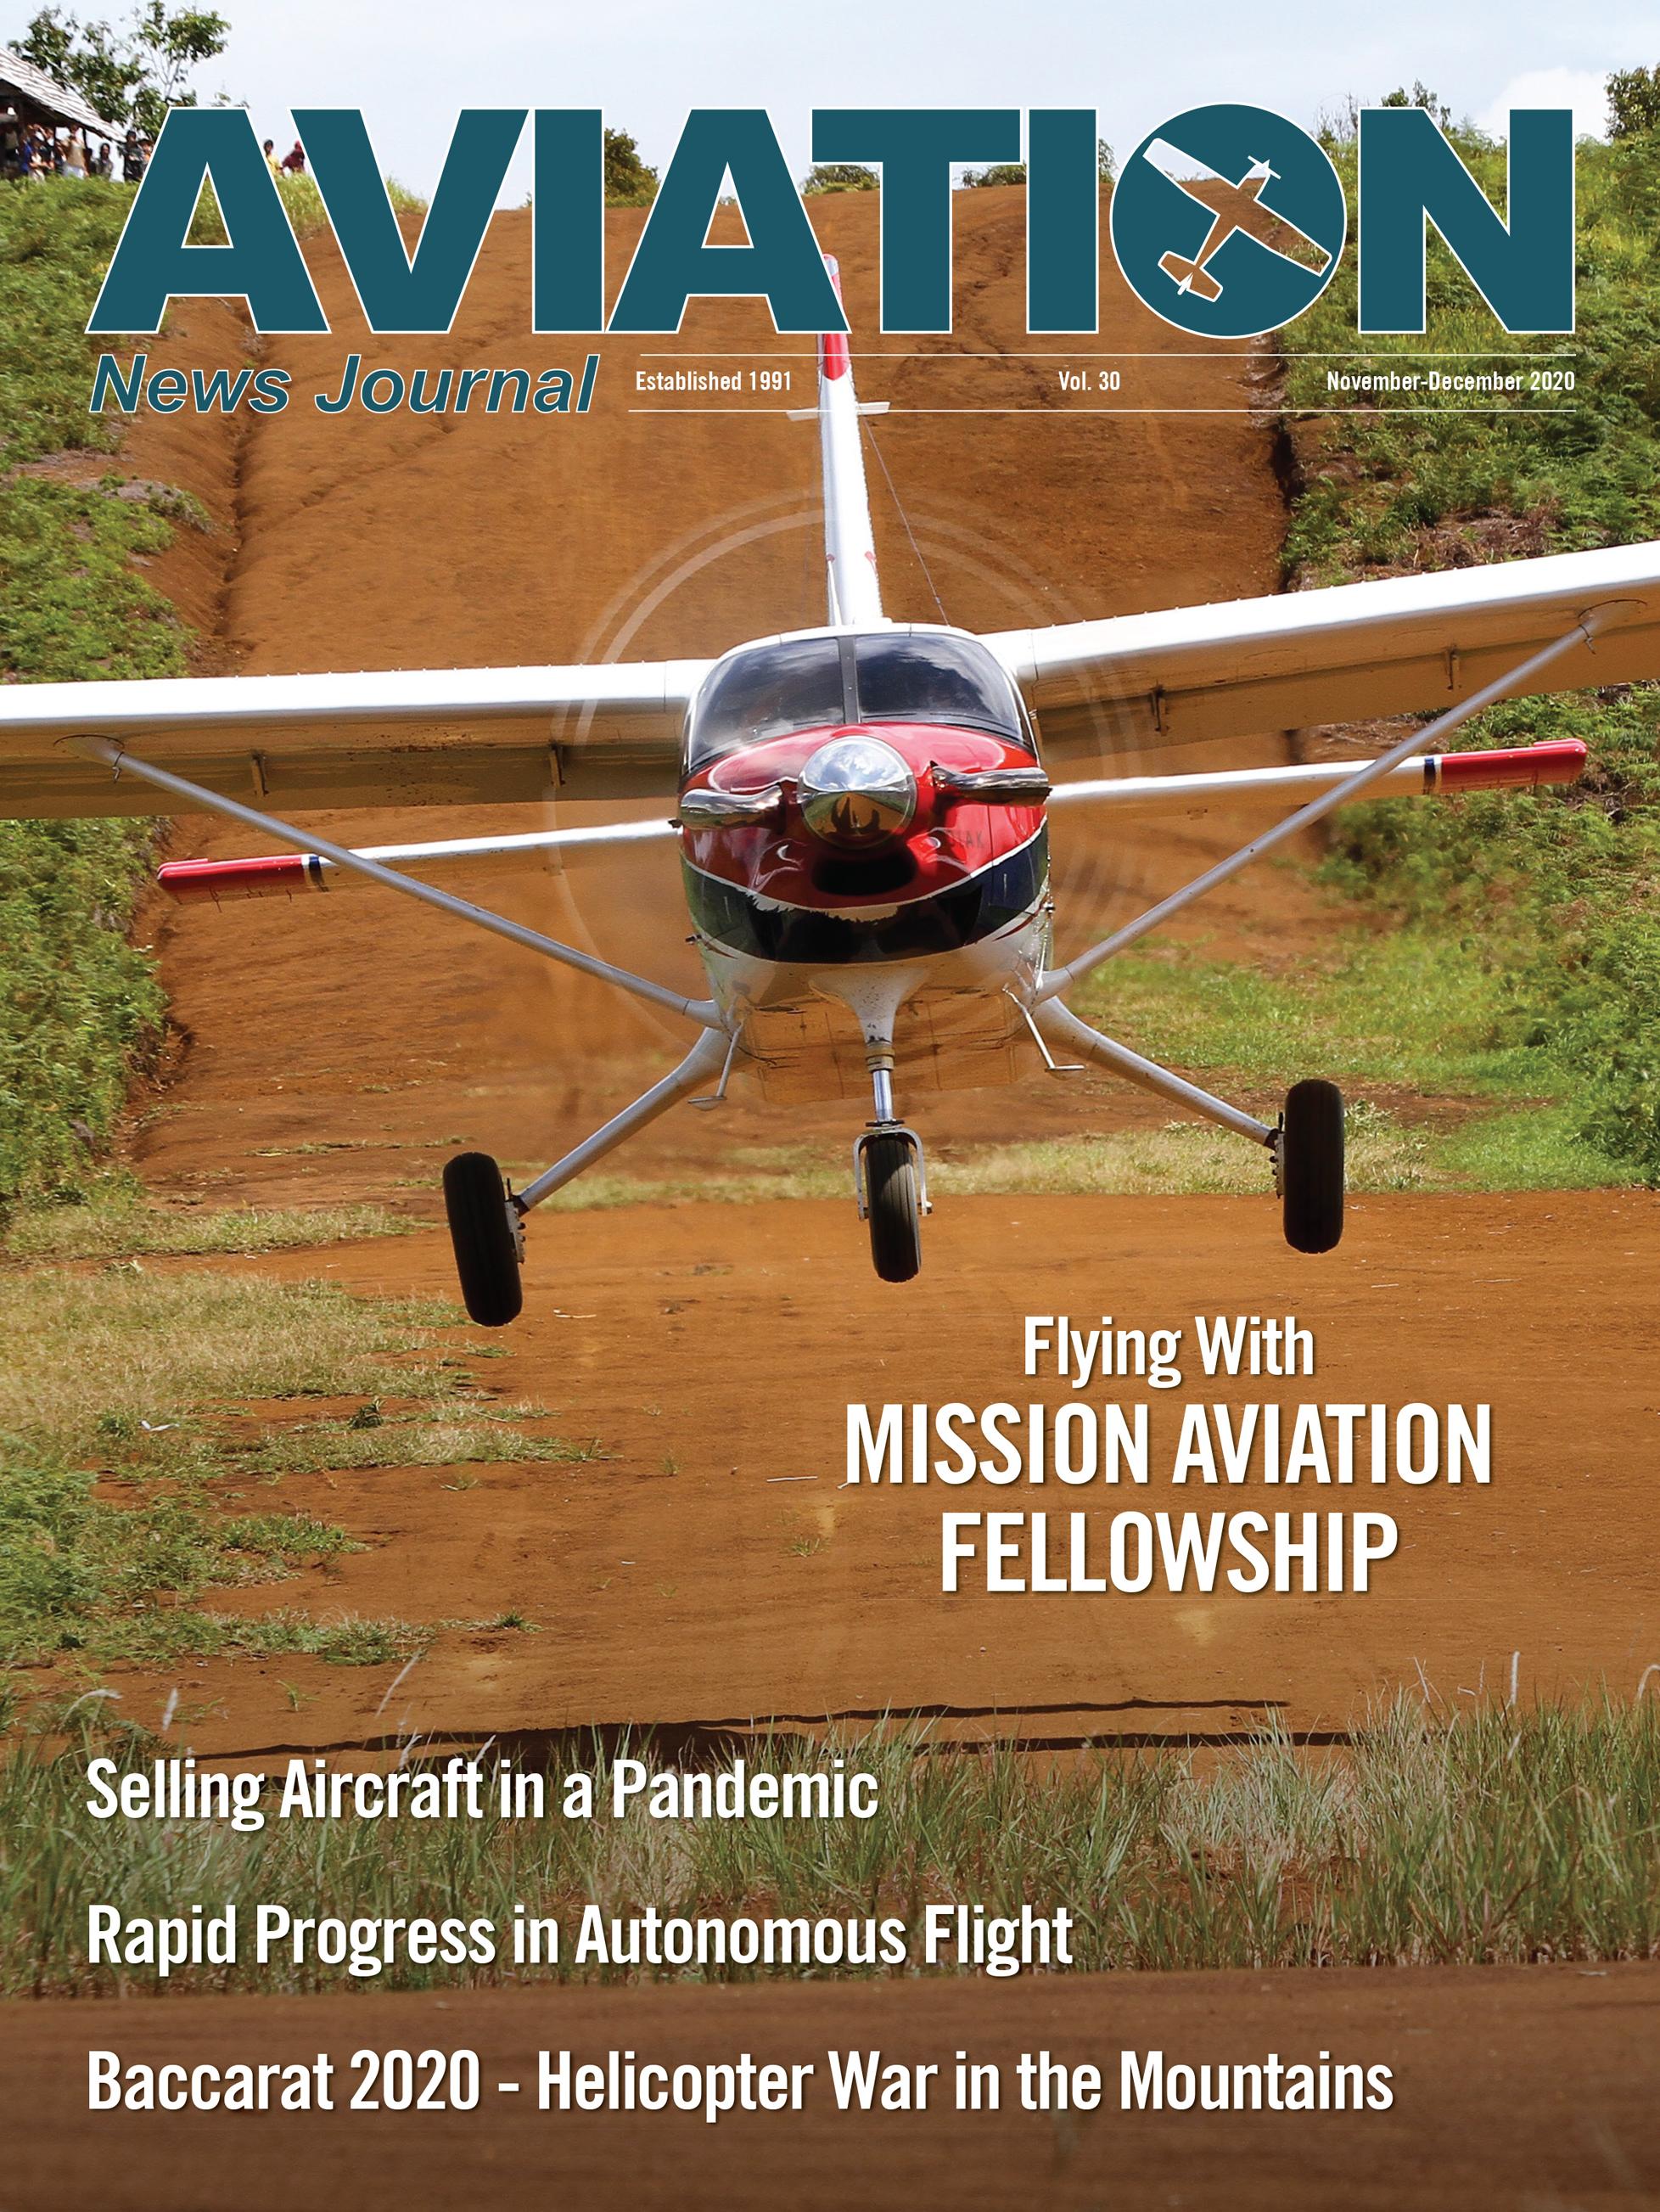 Aviation News Journal - November-December 2020